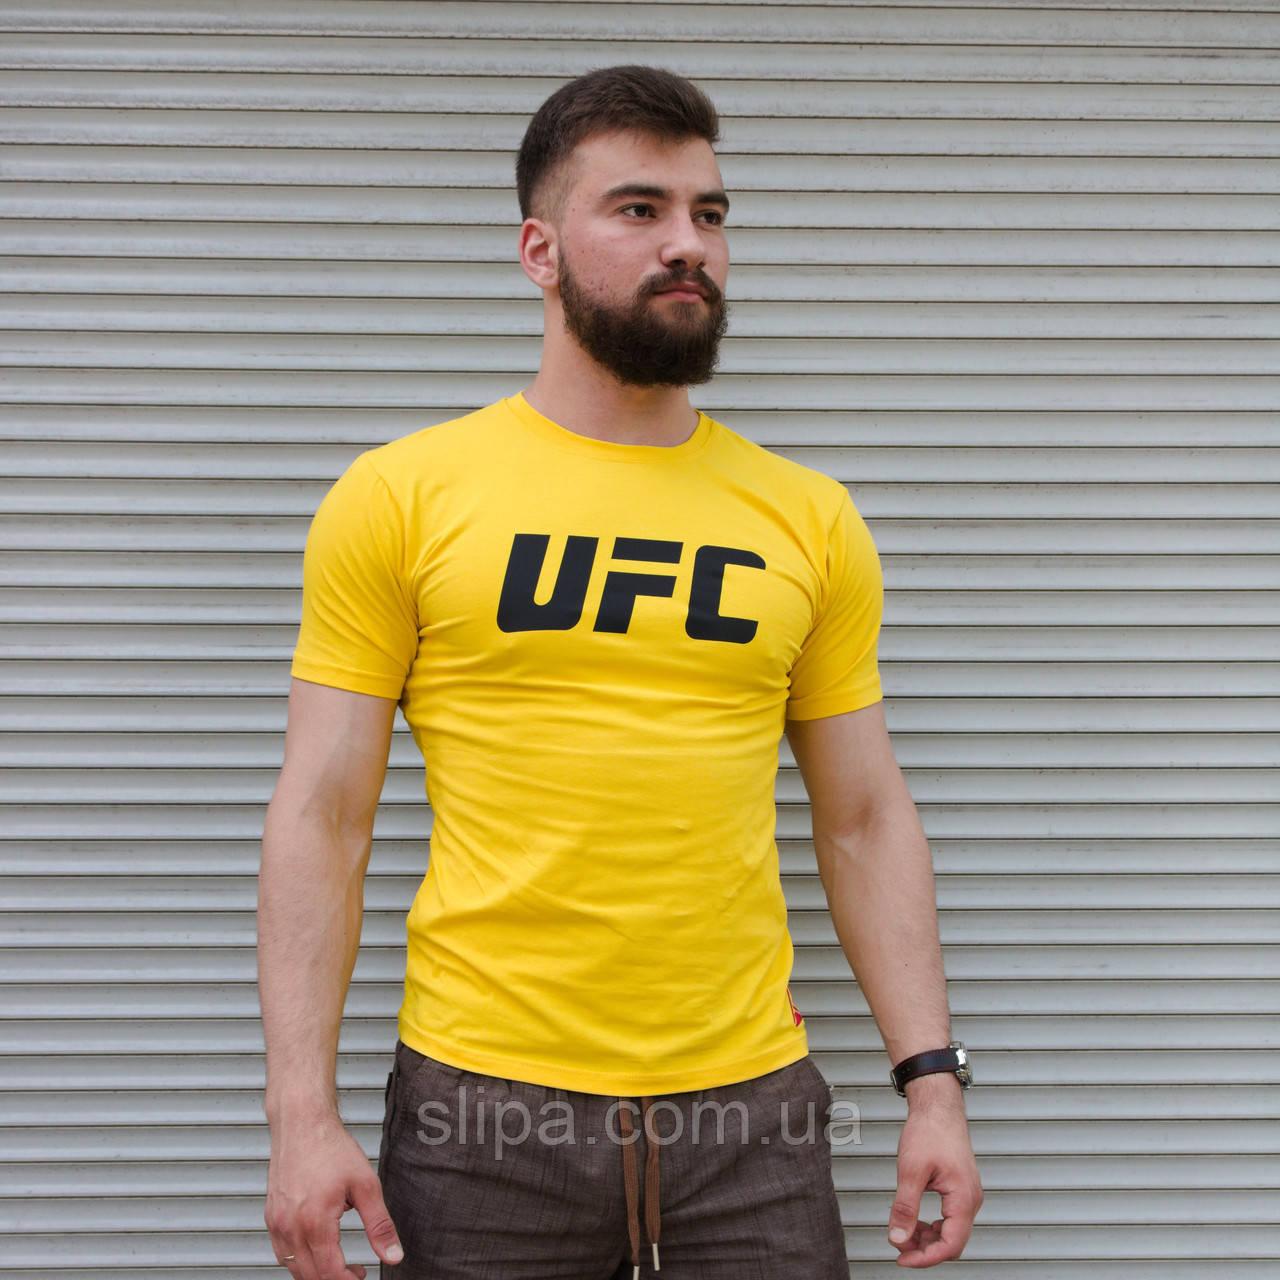 Чоловіча футболка Reebok ufc жовта Туреччина